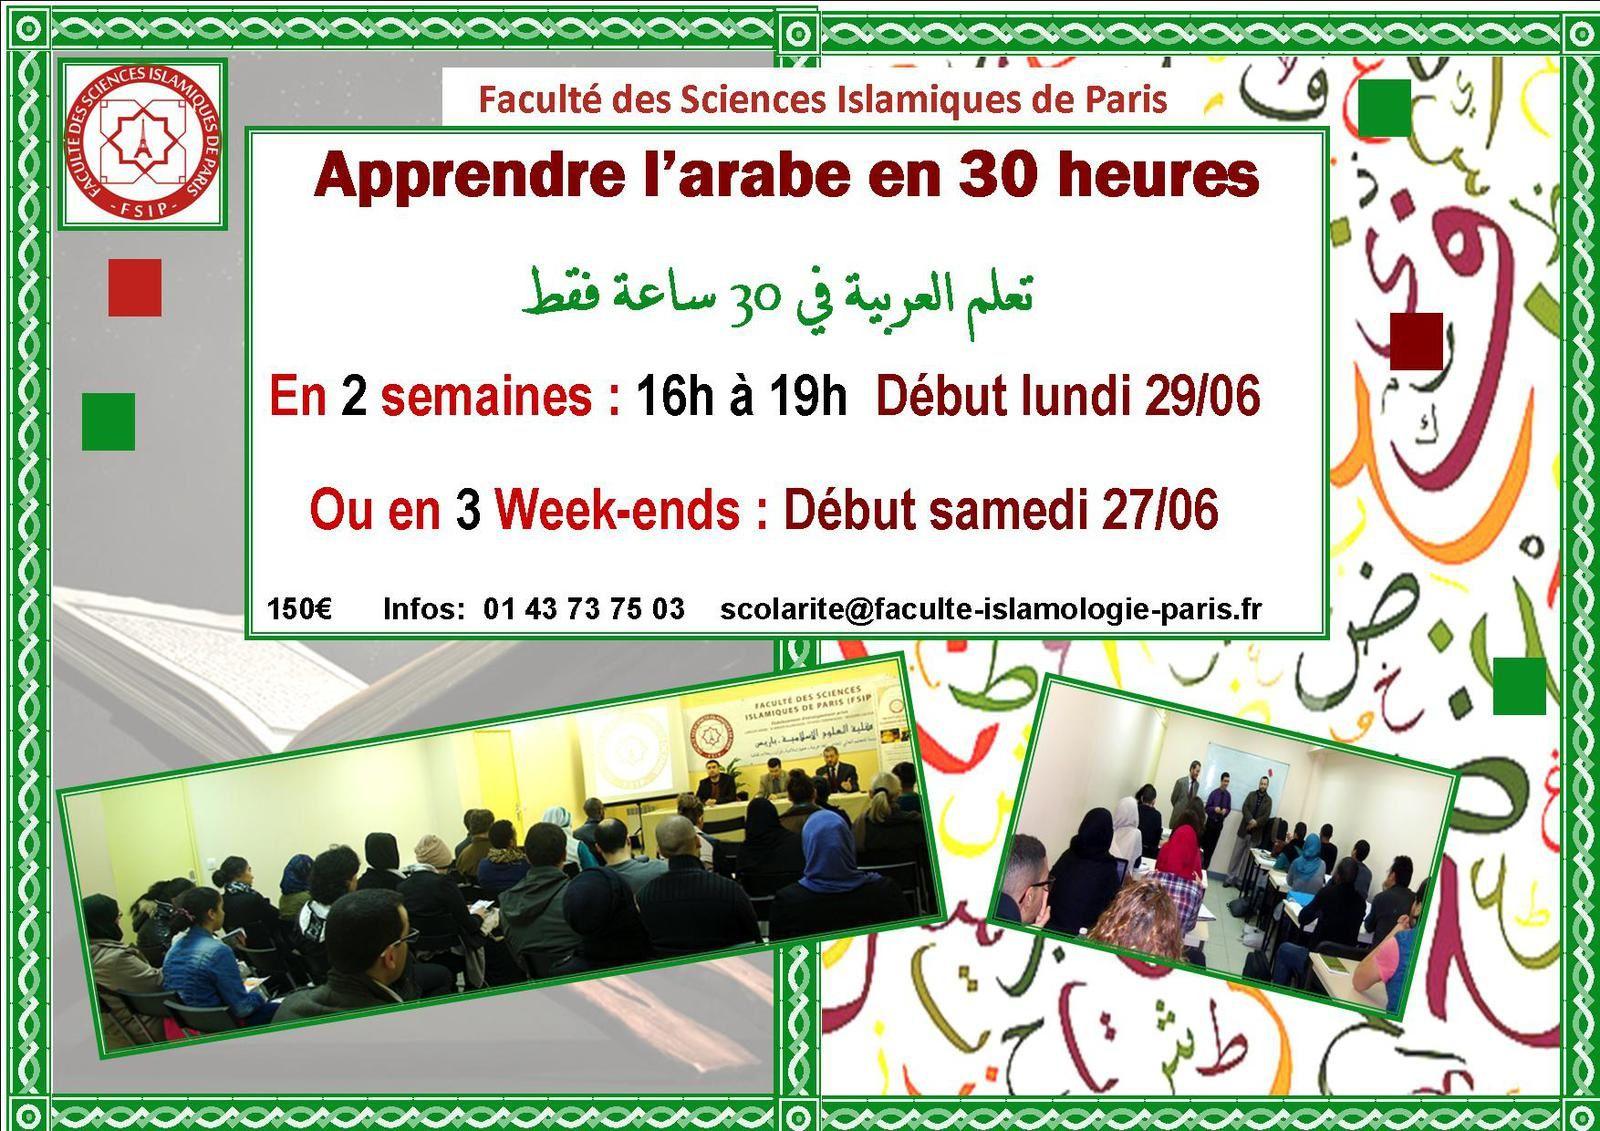 APPRENDRE l'arabe en 30 heures seulement   تعلم العربية \ قراءة القرآن في 30 ساعة